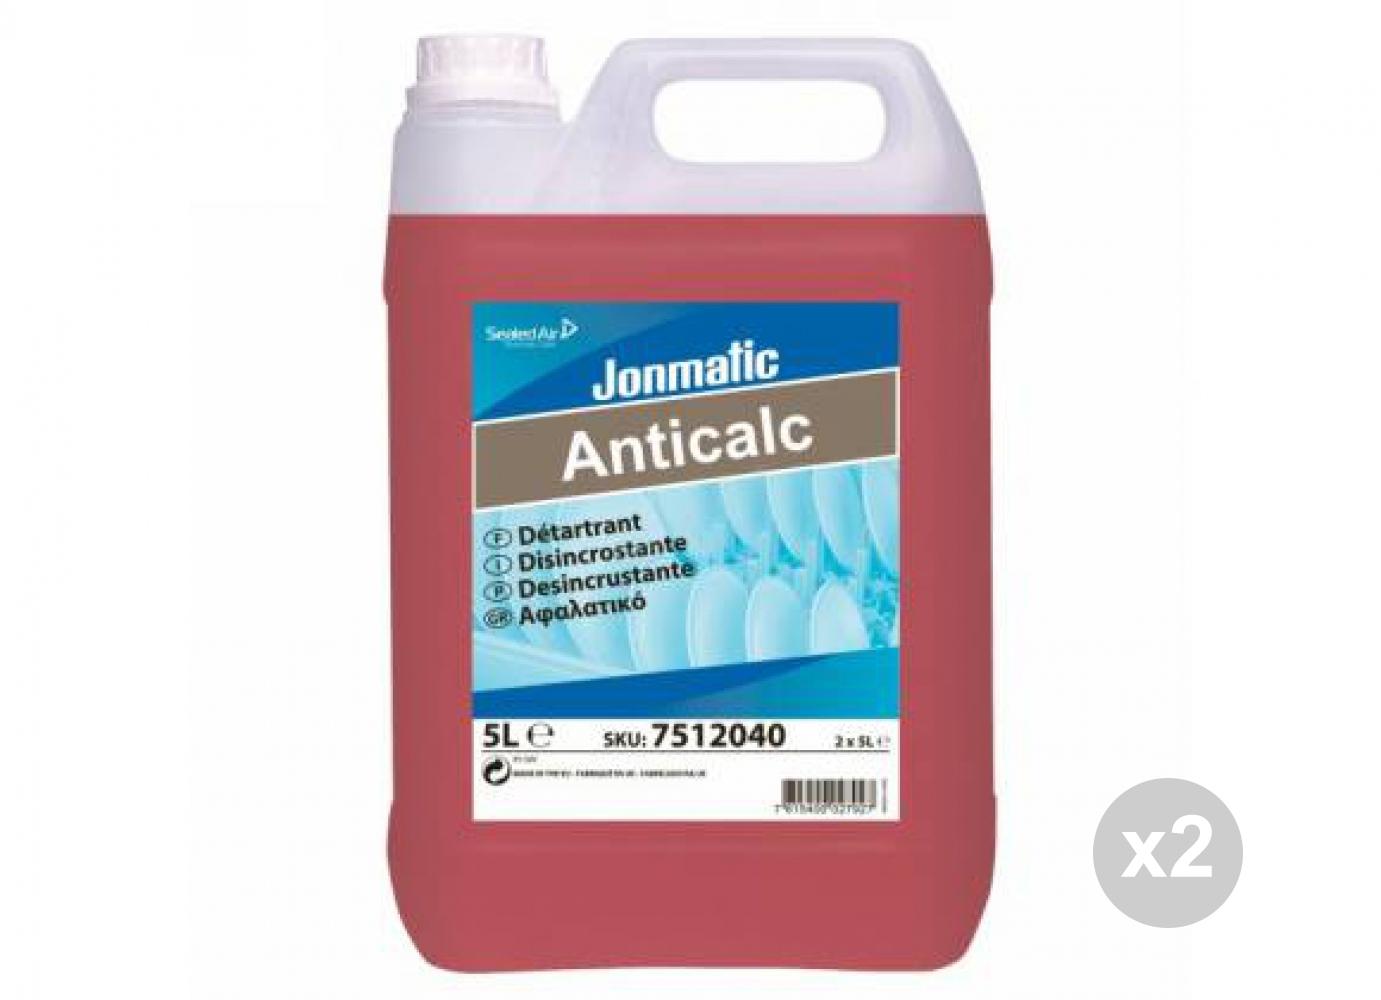 Acquista Set 2 Jonmatic Anticalc Kg 17545834 | Glooke.com